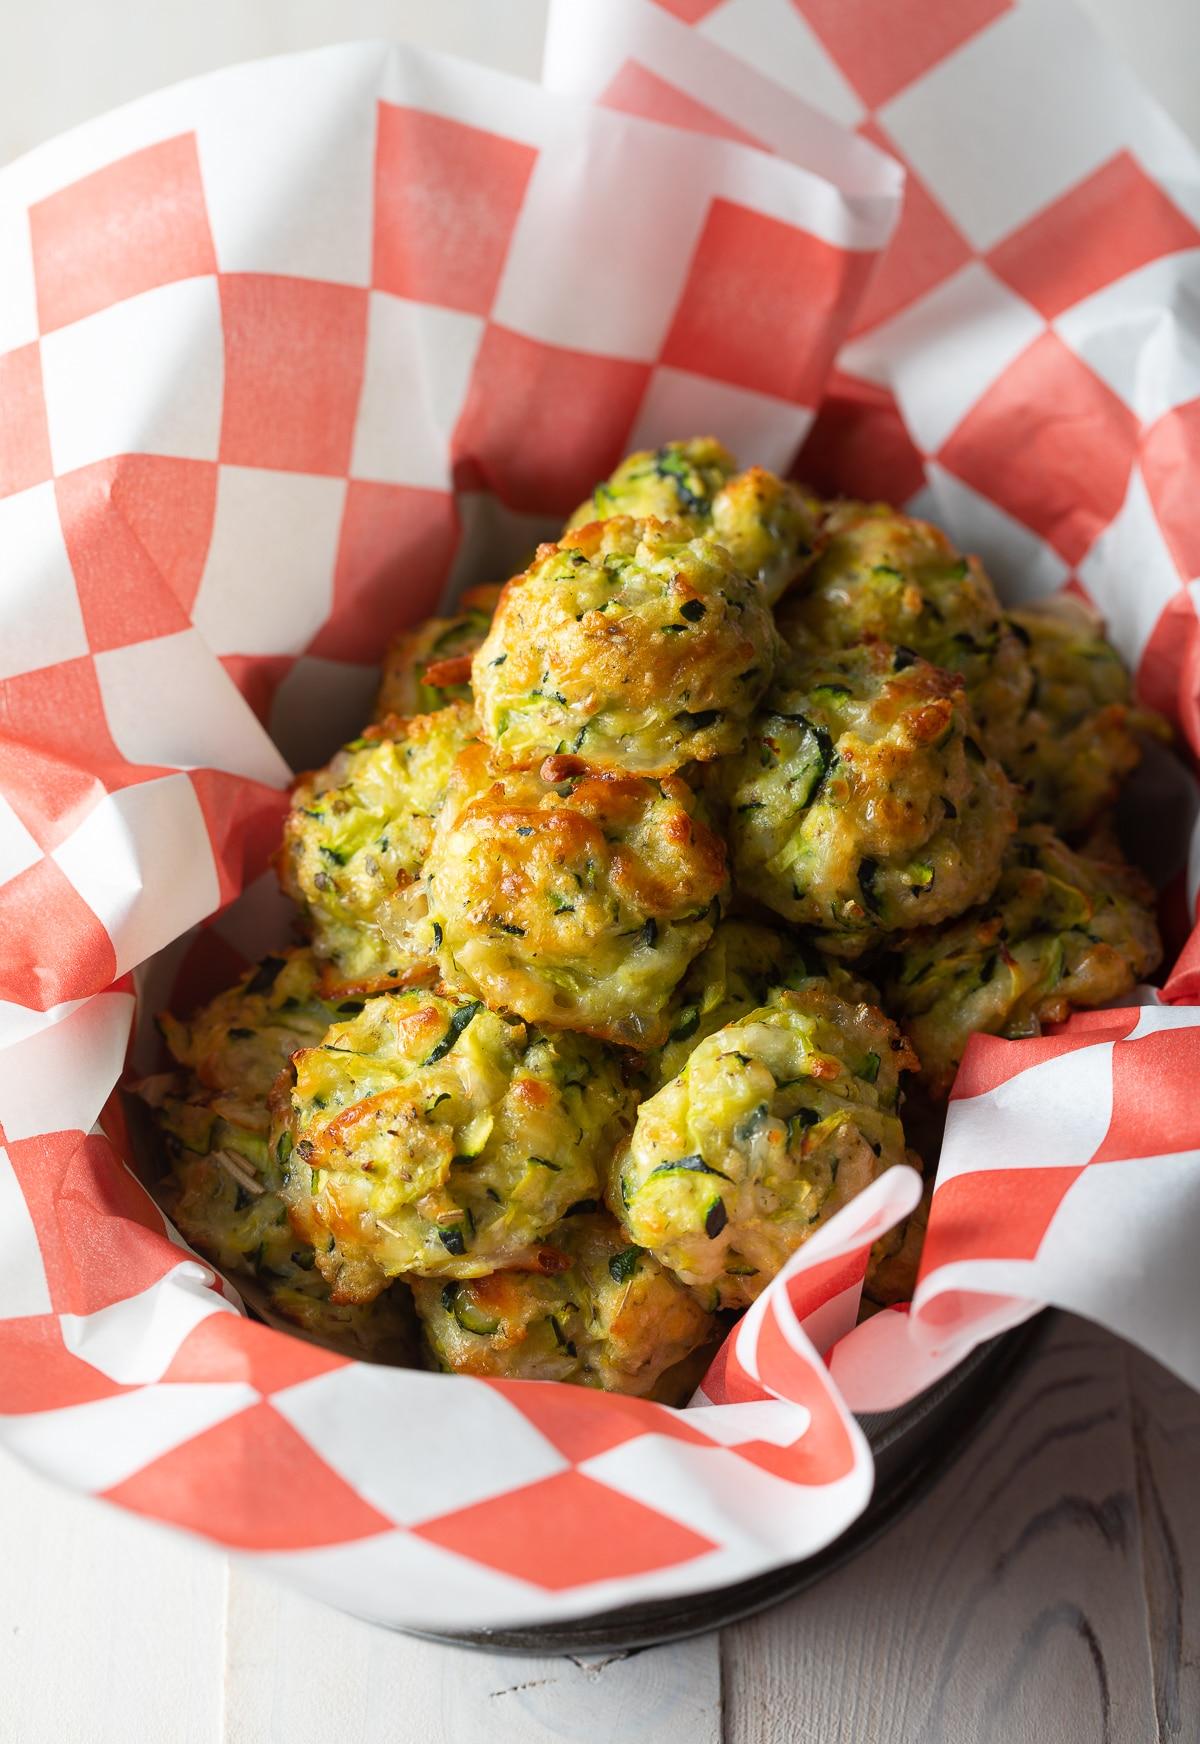 Healthy Baked Zucchini Tots (Gluten Free!) | #ASpicyPerspective #glutenfree #tots #zucchini #healthy